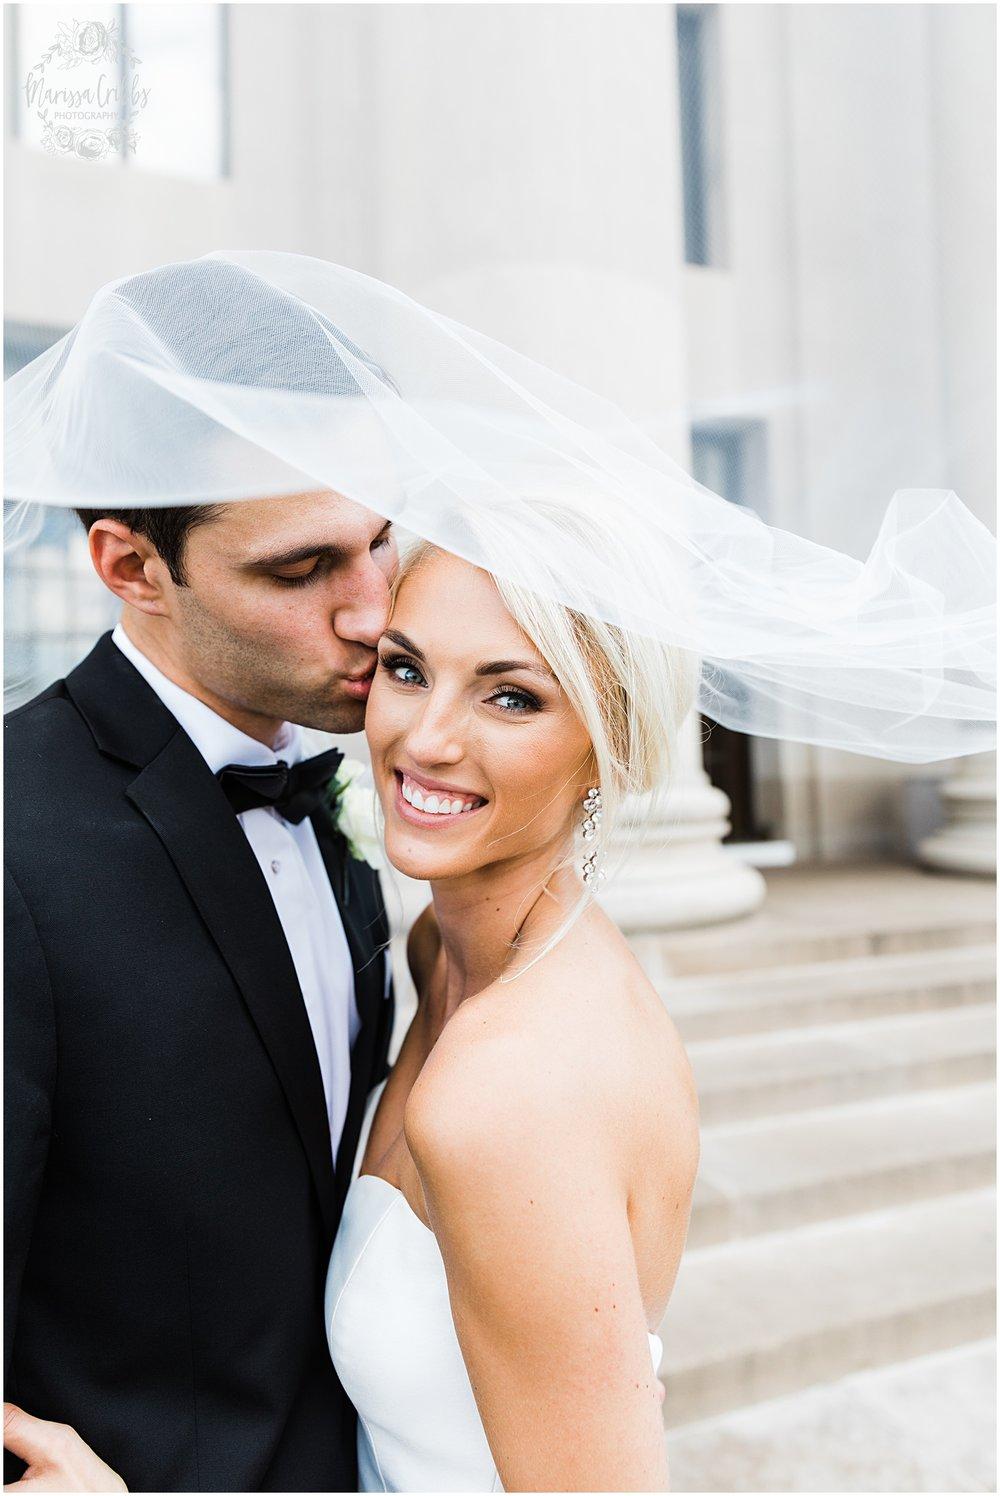 NOLL WEDDING | THE BRASS ON BALTIMORE | MARISSA CRIBBS PHOTOGRAPHY_6326.jpg